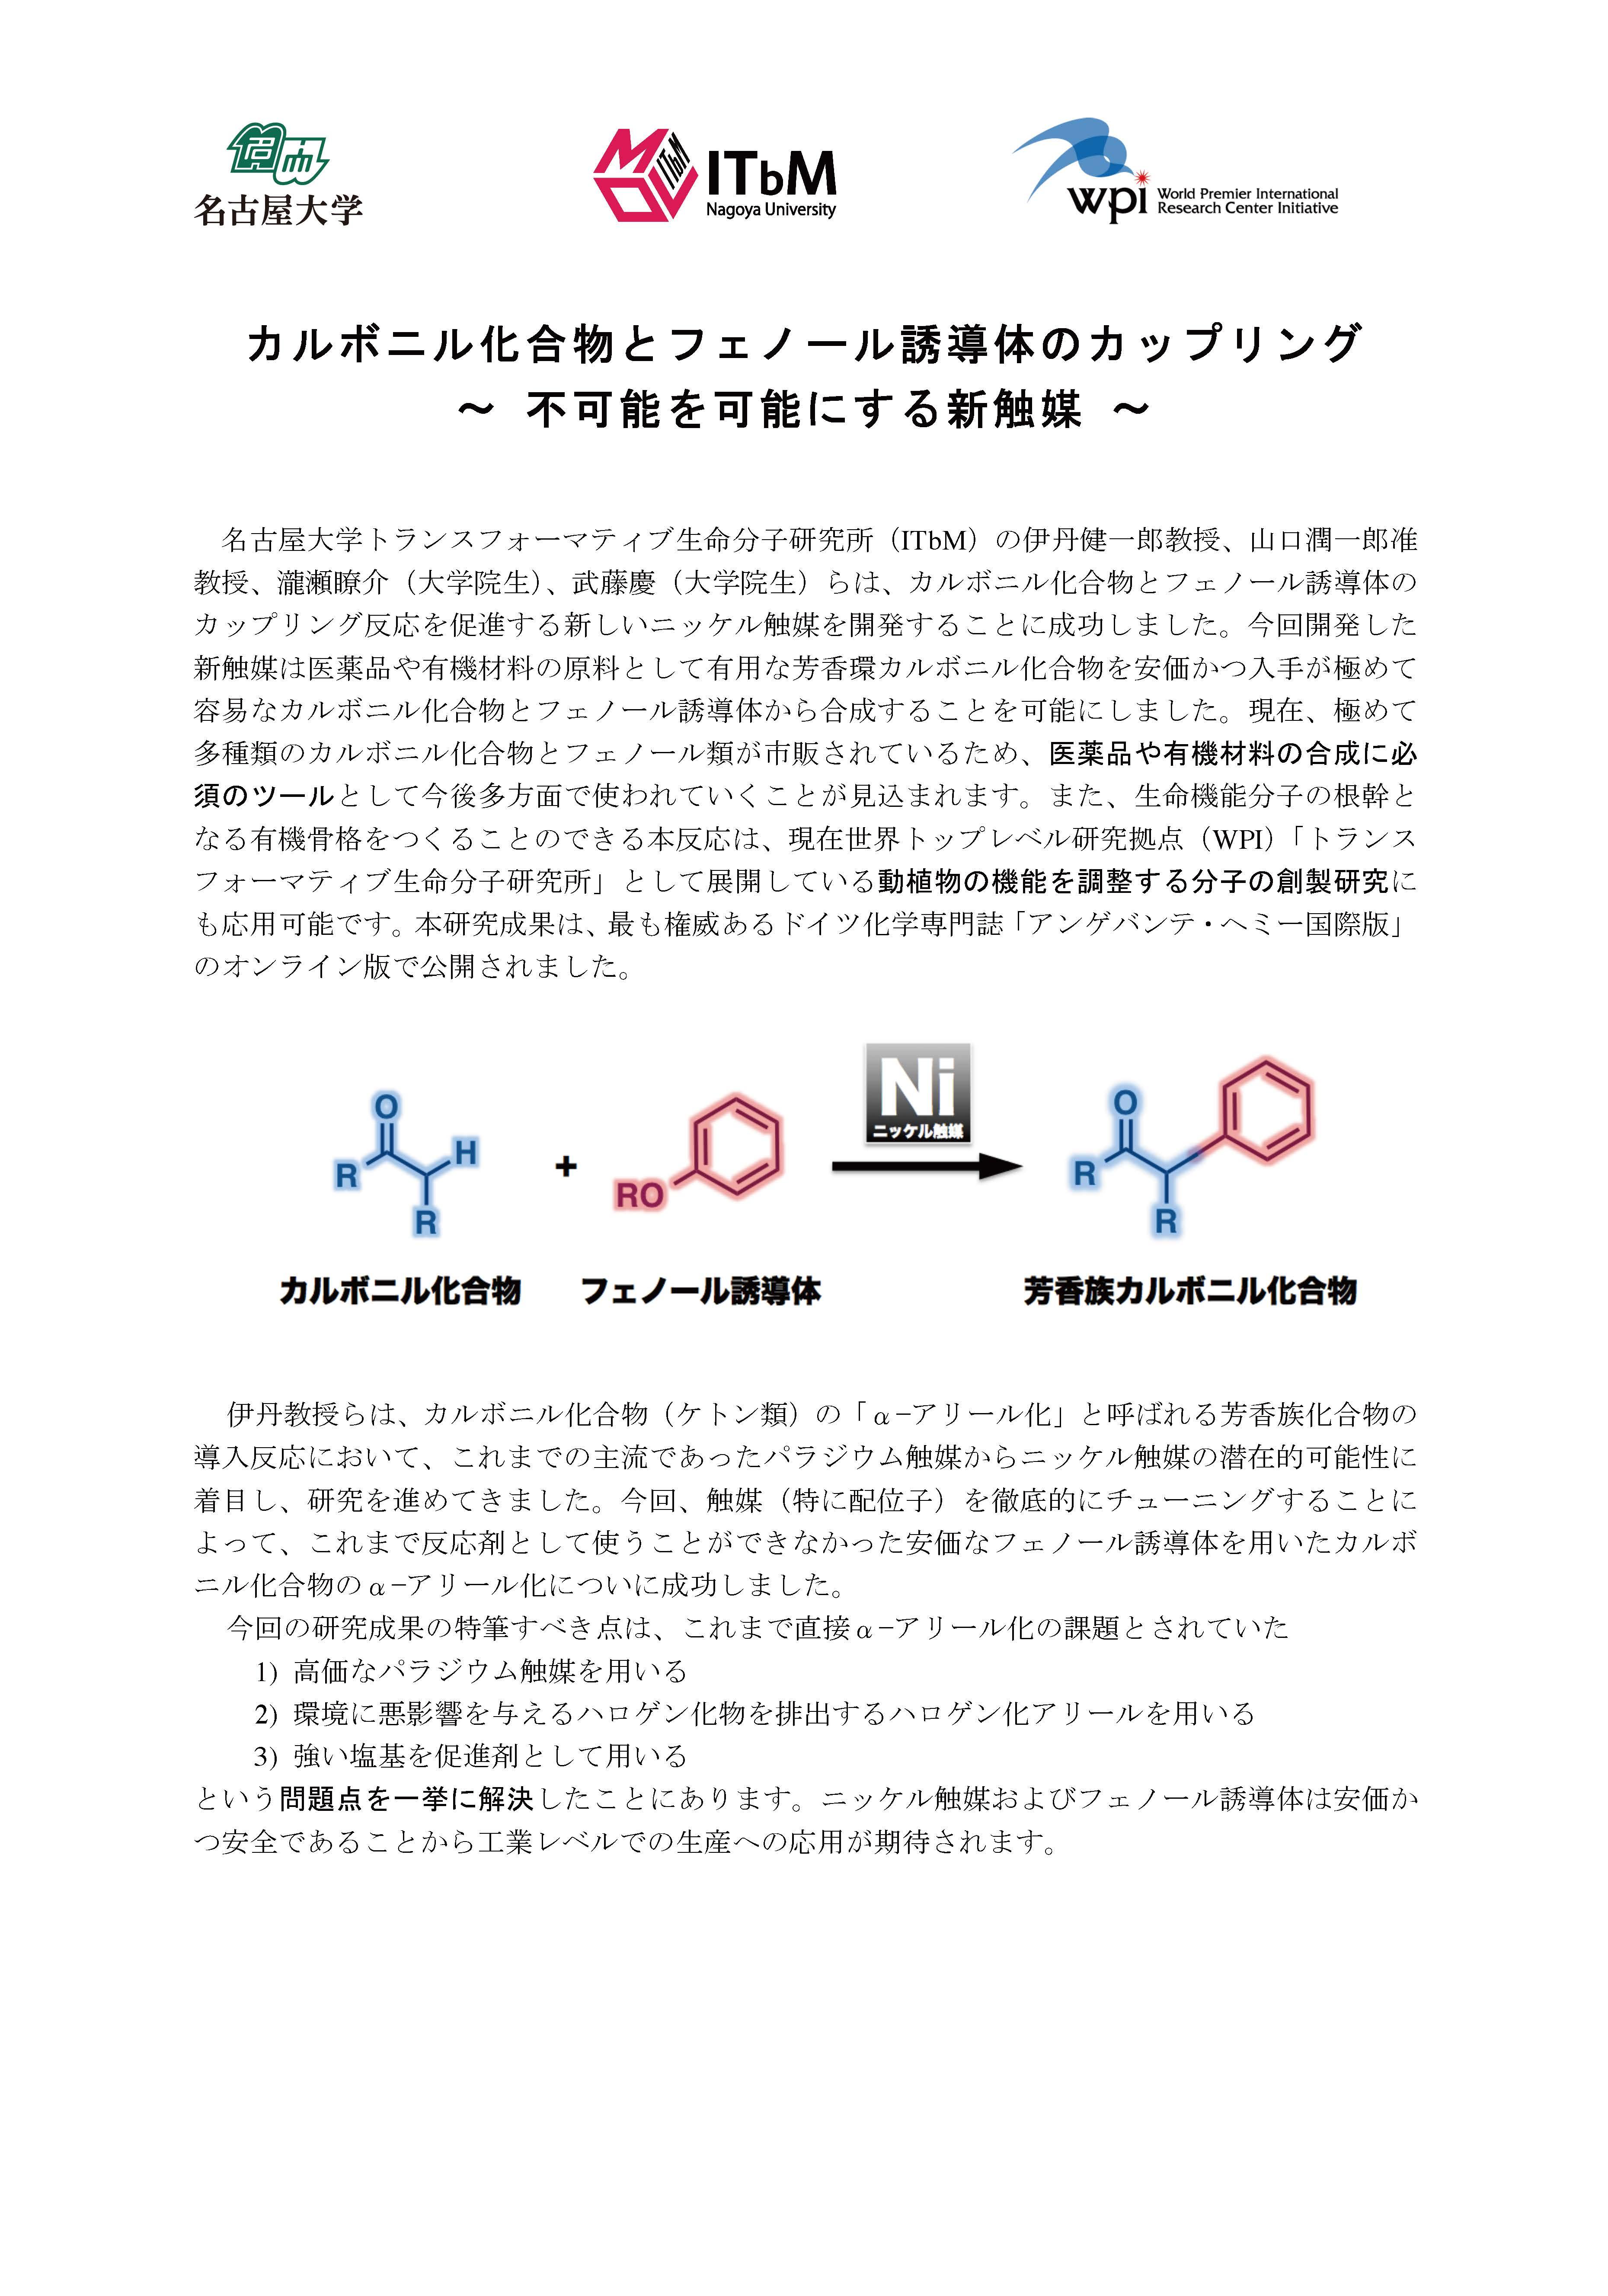 http://www.itbm.nagoya-u.ac.jp/ja/research/20140526_AngewPressRelease_JP.jpg